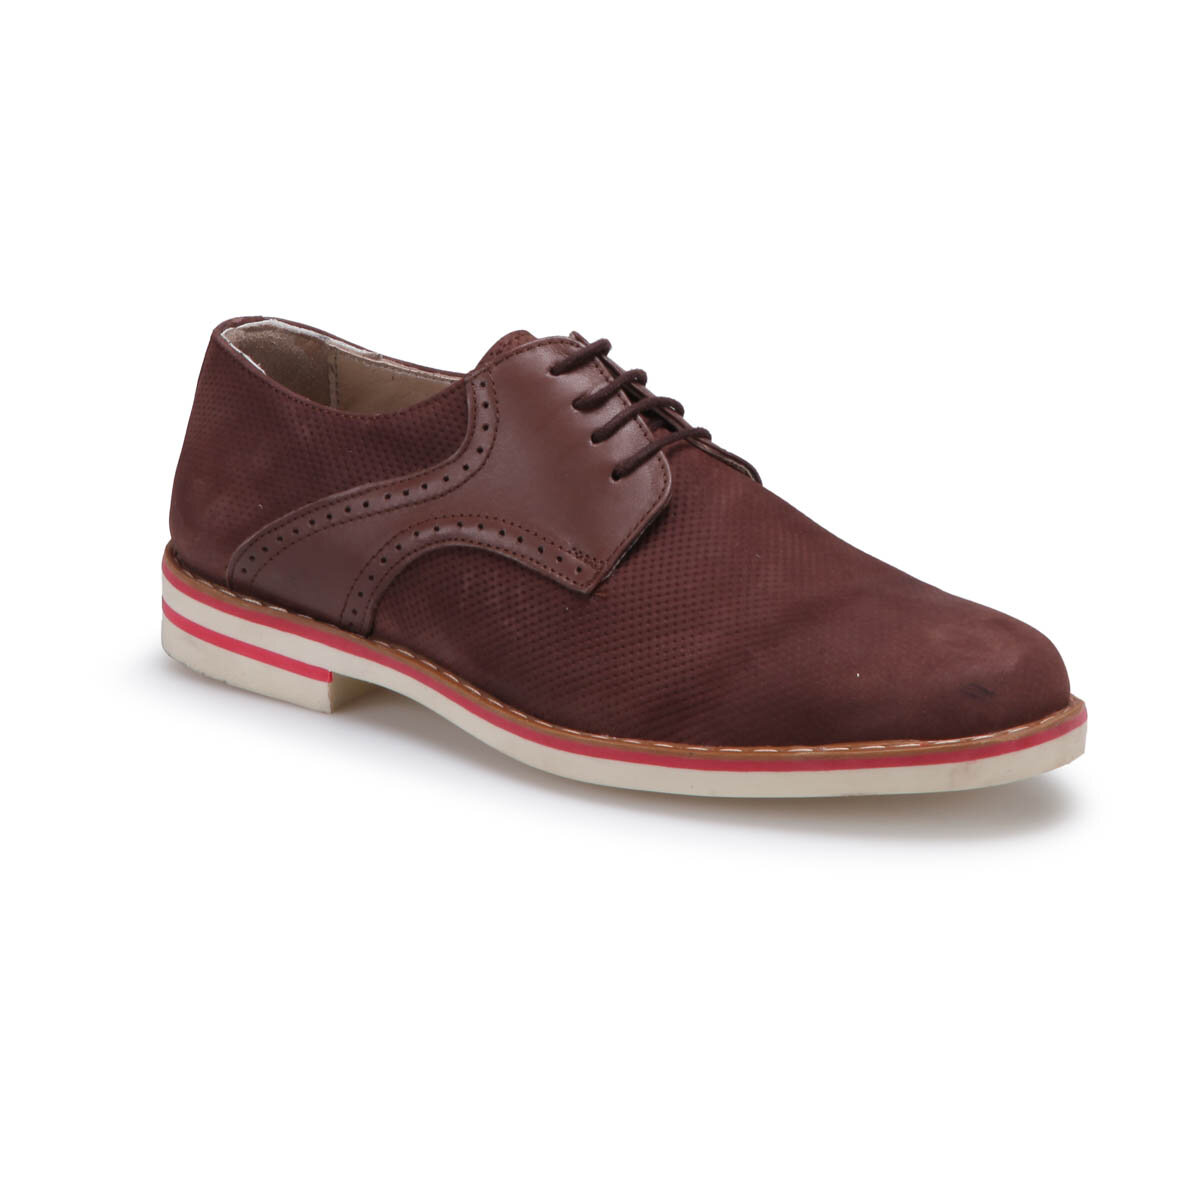 FLO PRG-5 M 6683 Brown Men 'S Modern Shoes Garamond